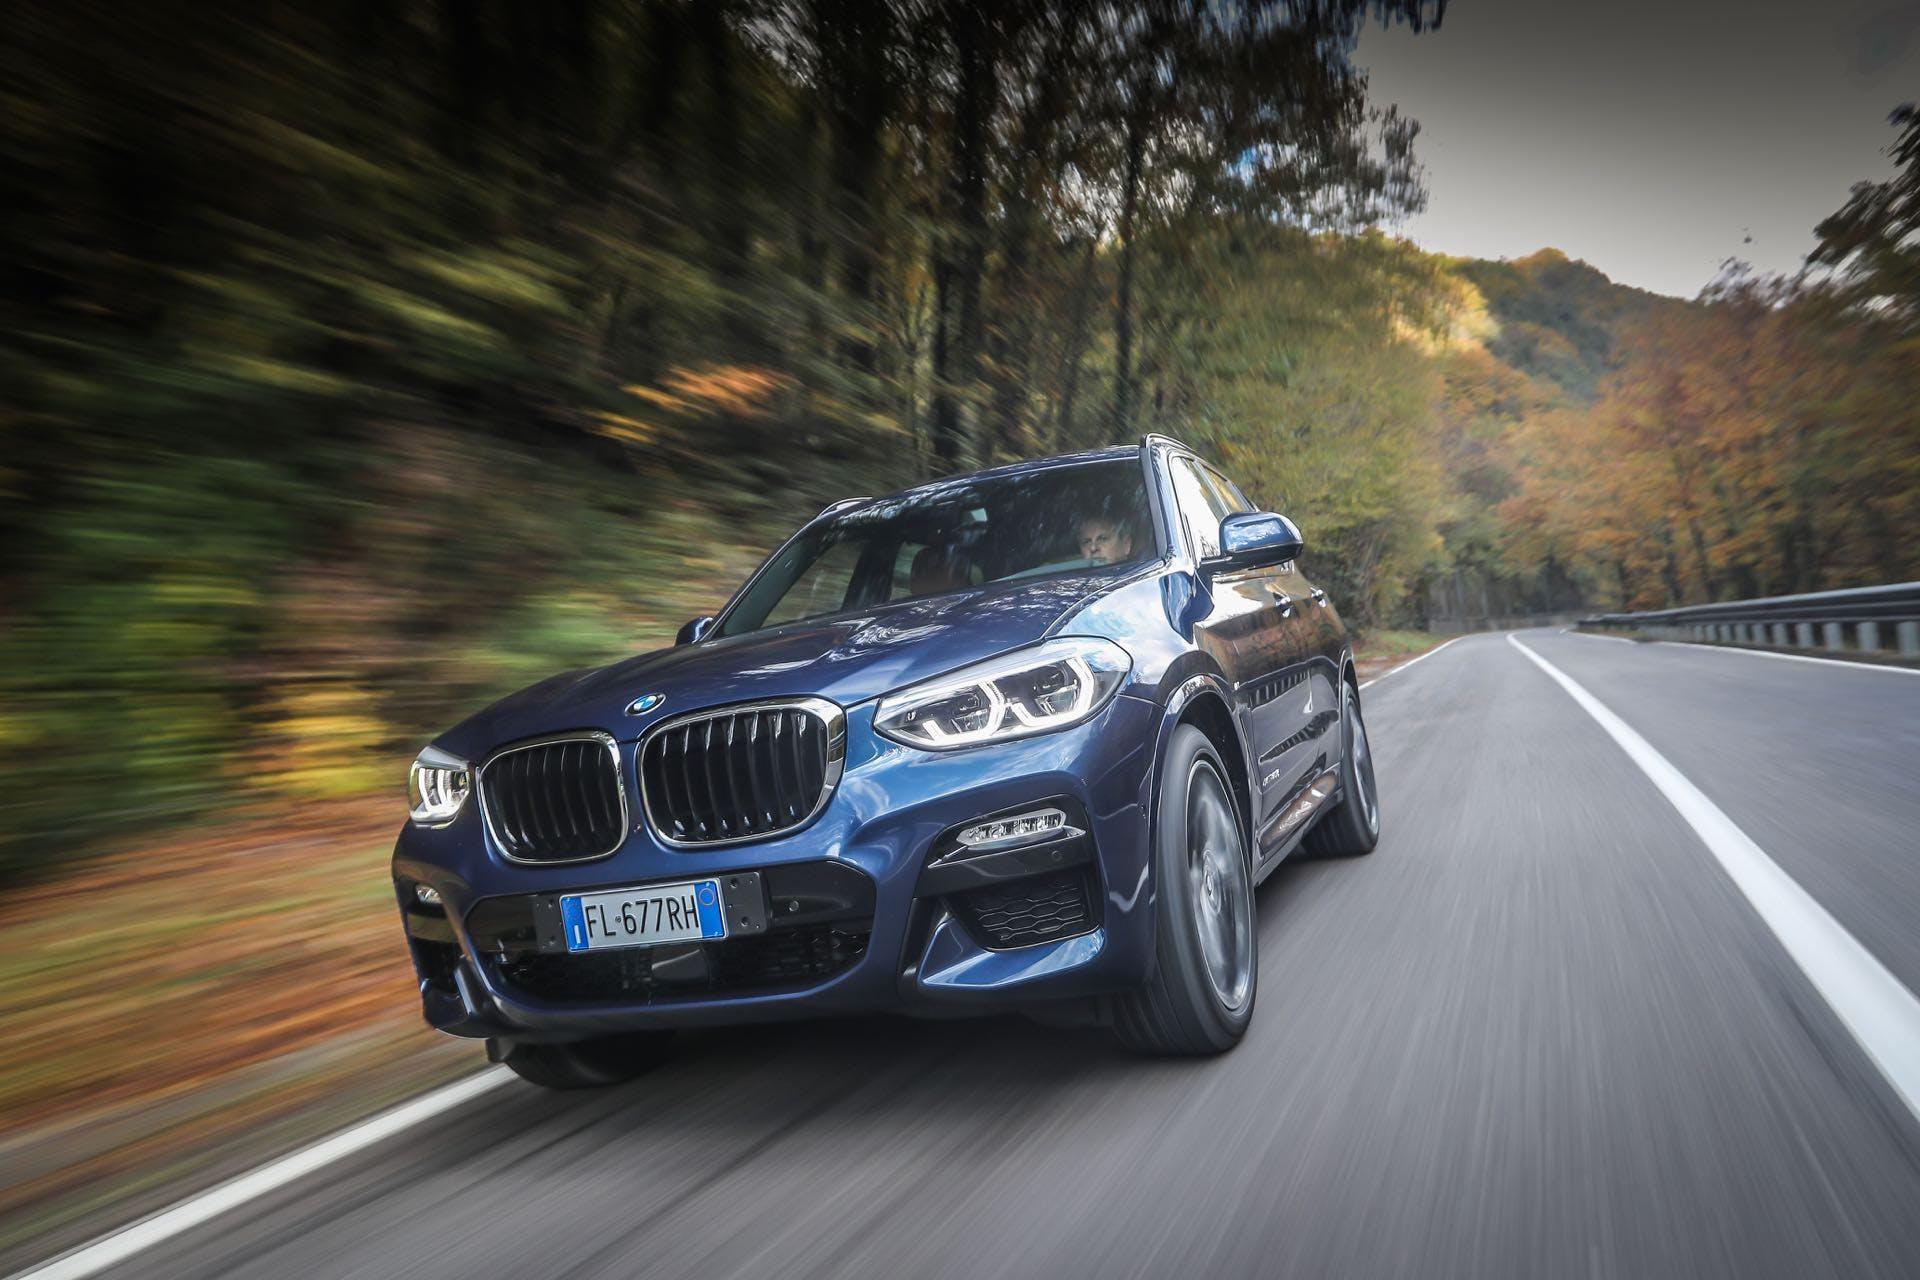 BMW X3 color blu guidata su strada vista frontalmente